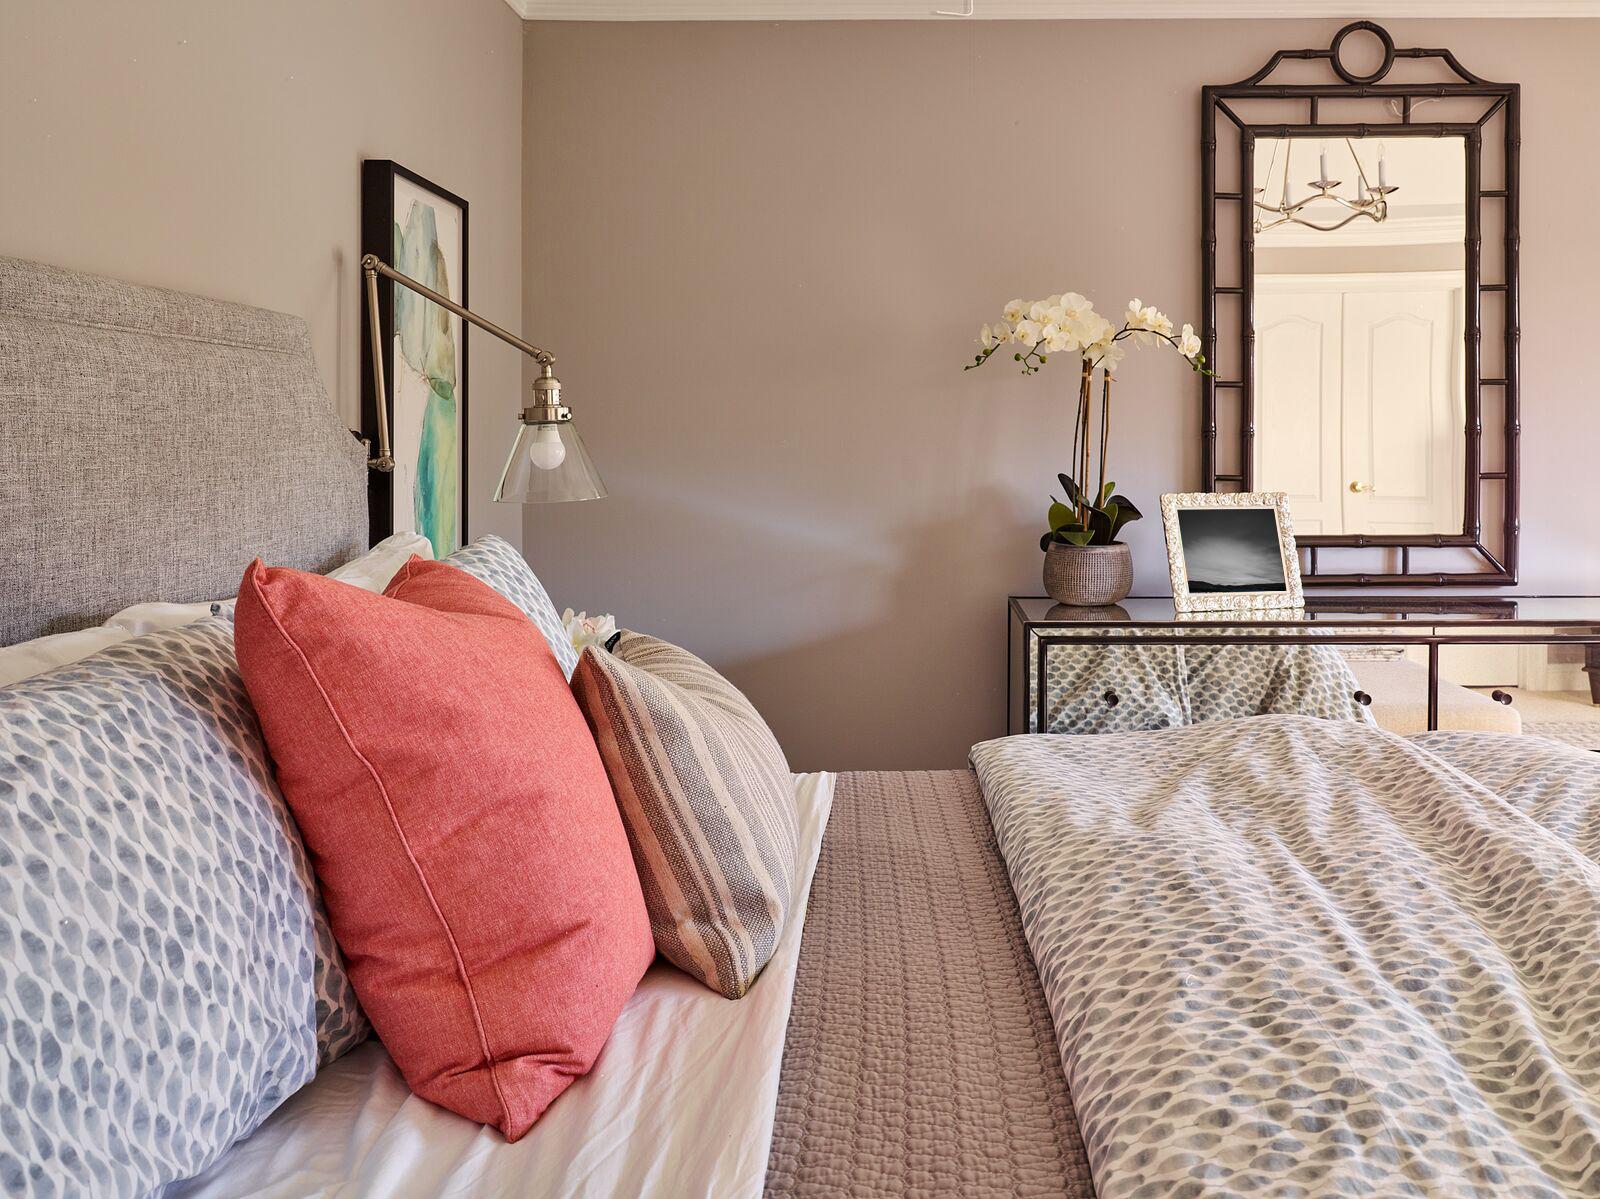 bedroom copy (2) (1).jpg